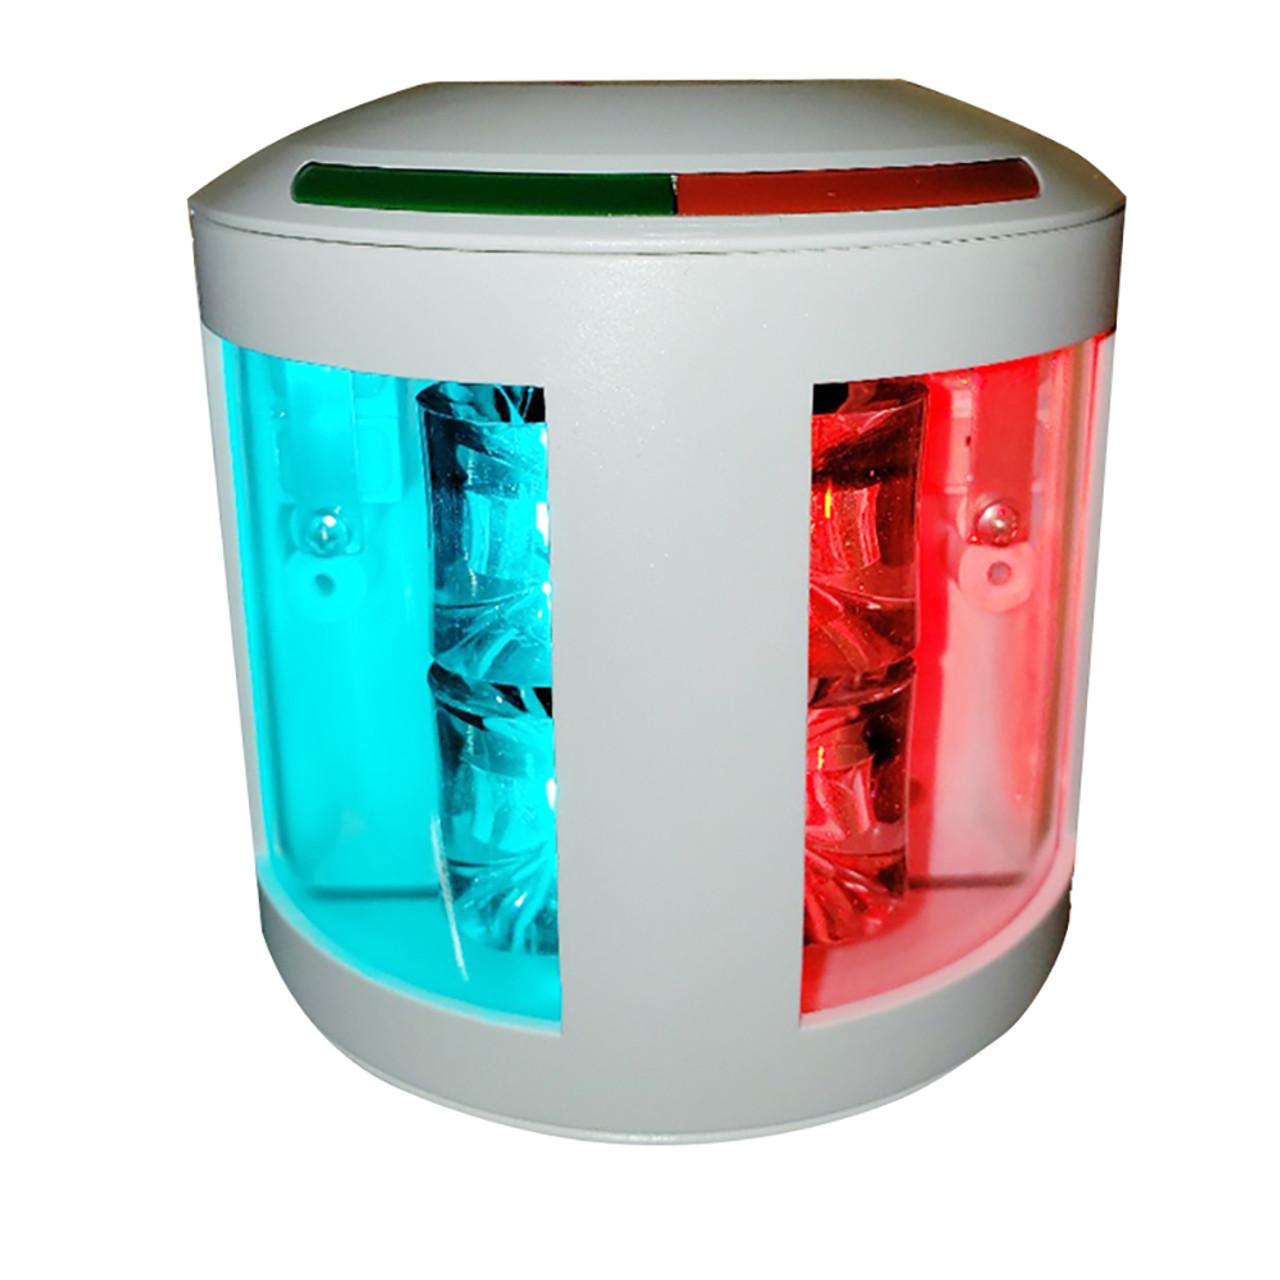 AQUASIGNAL Series 43 Bi-Color Navigation Light LED Black Housing